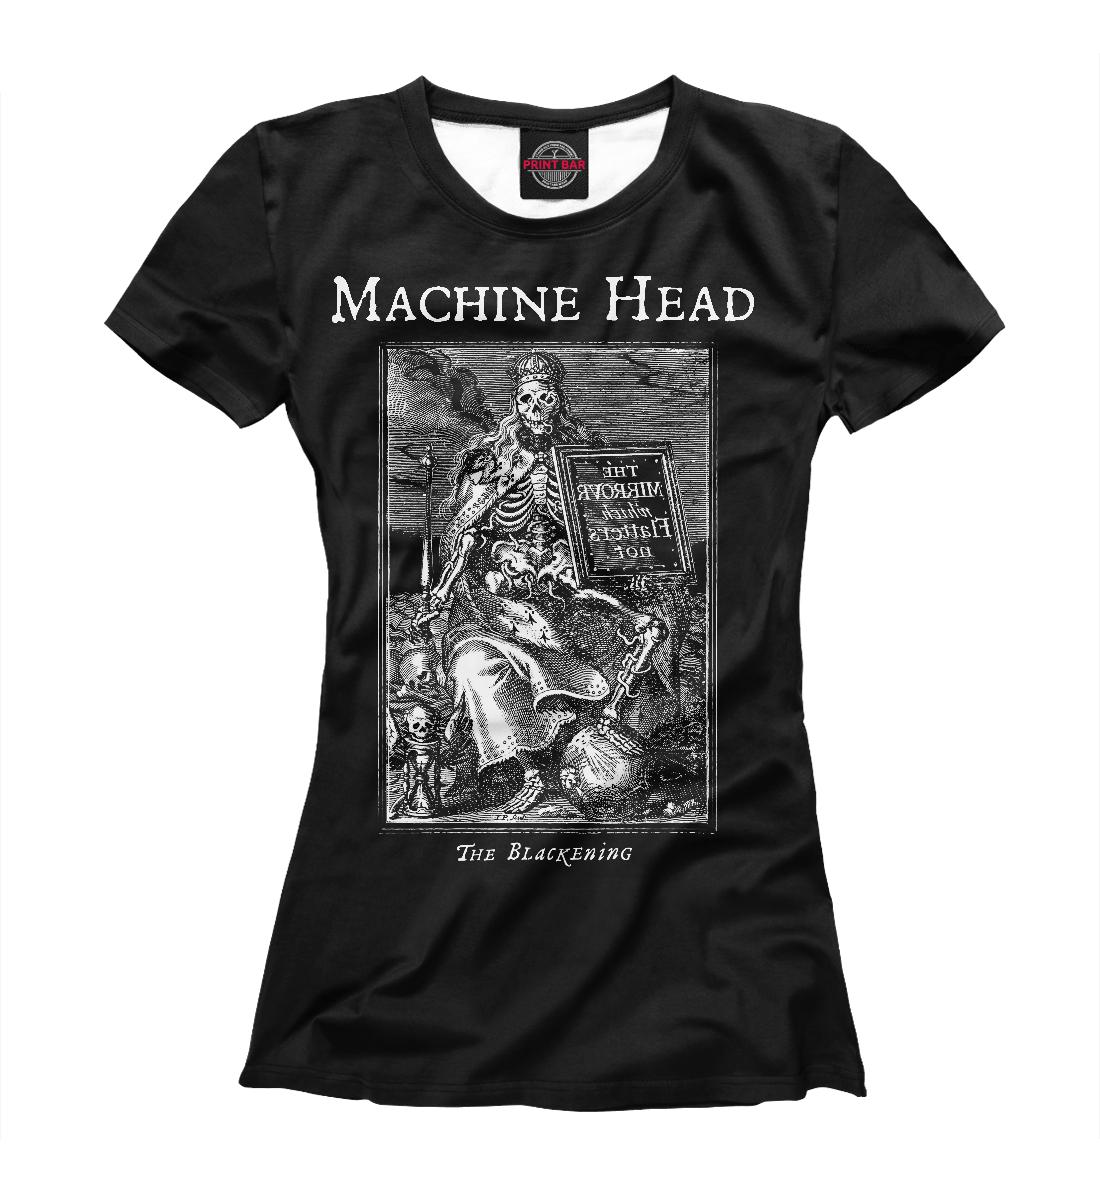 Купить Machine Head, Printbar, Футболки, MZK-354049-fut-1